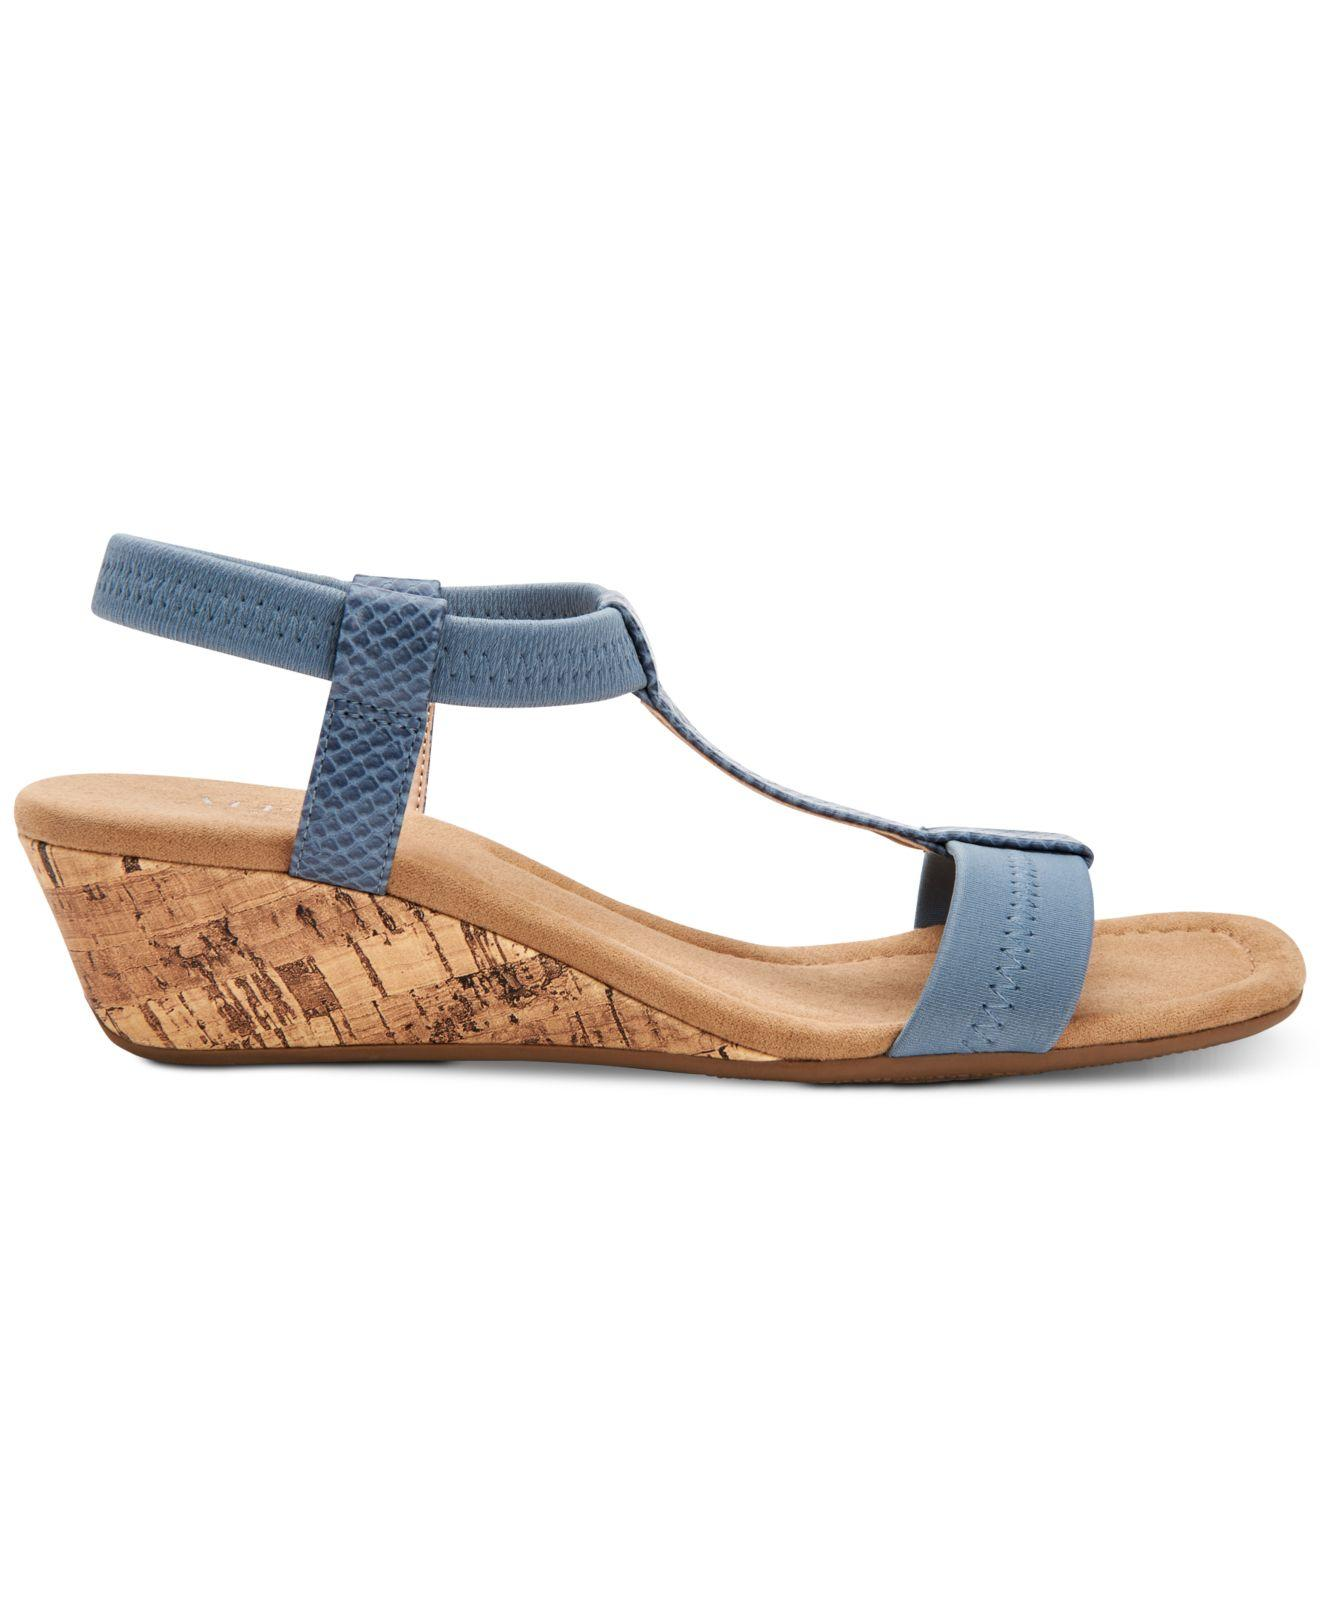 1ca951d91375 Lyst - Alfani Step  n Flex Voyage Wedge Sandals